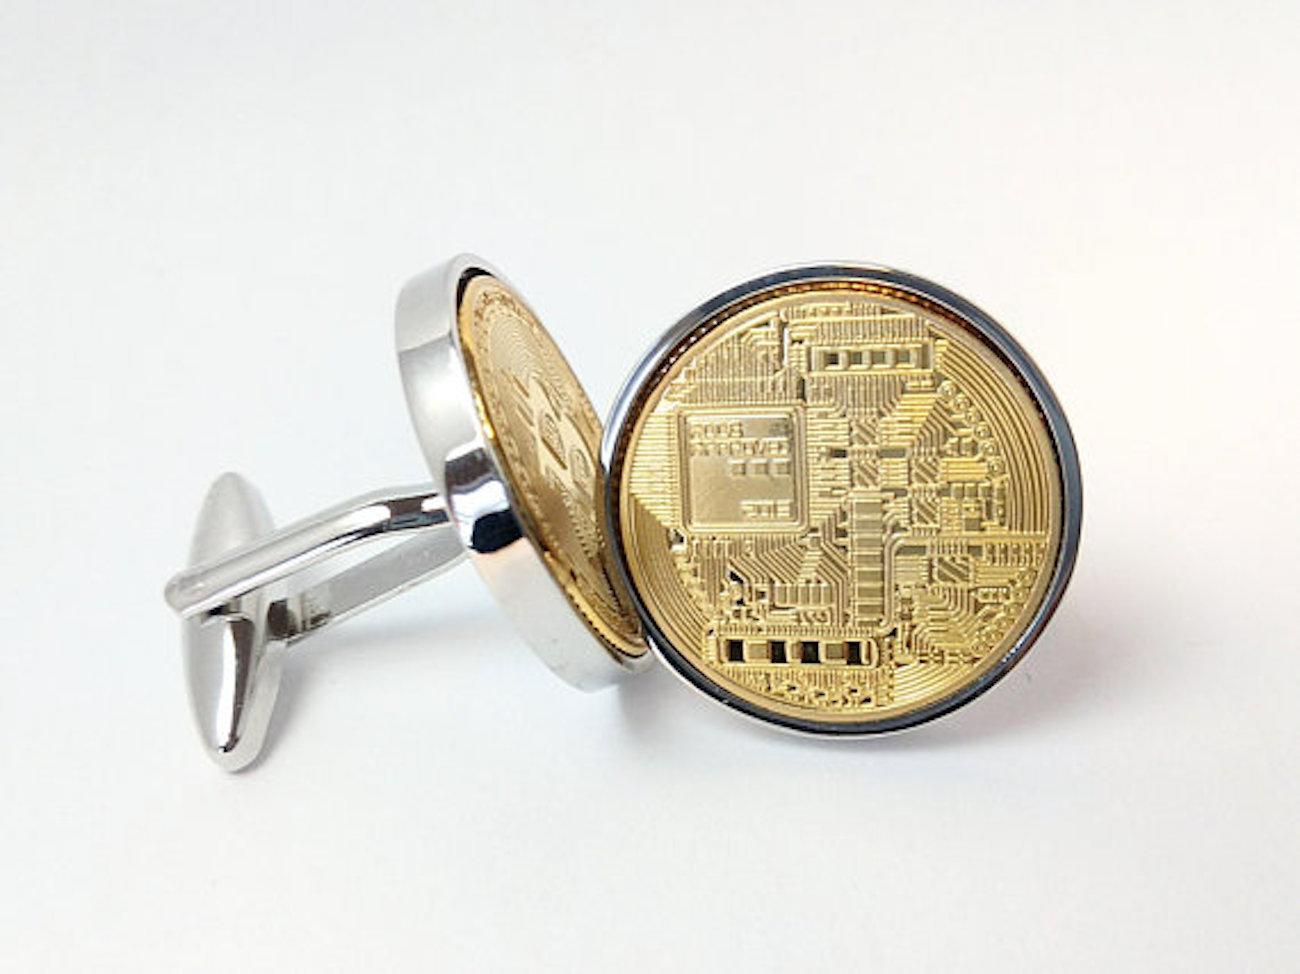 World Coin Cufflinks Gold Plated Bitcoin Cufflinks